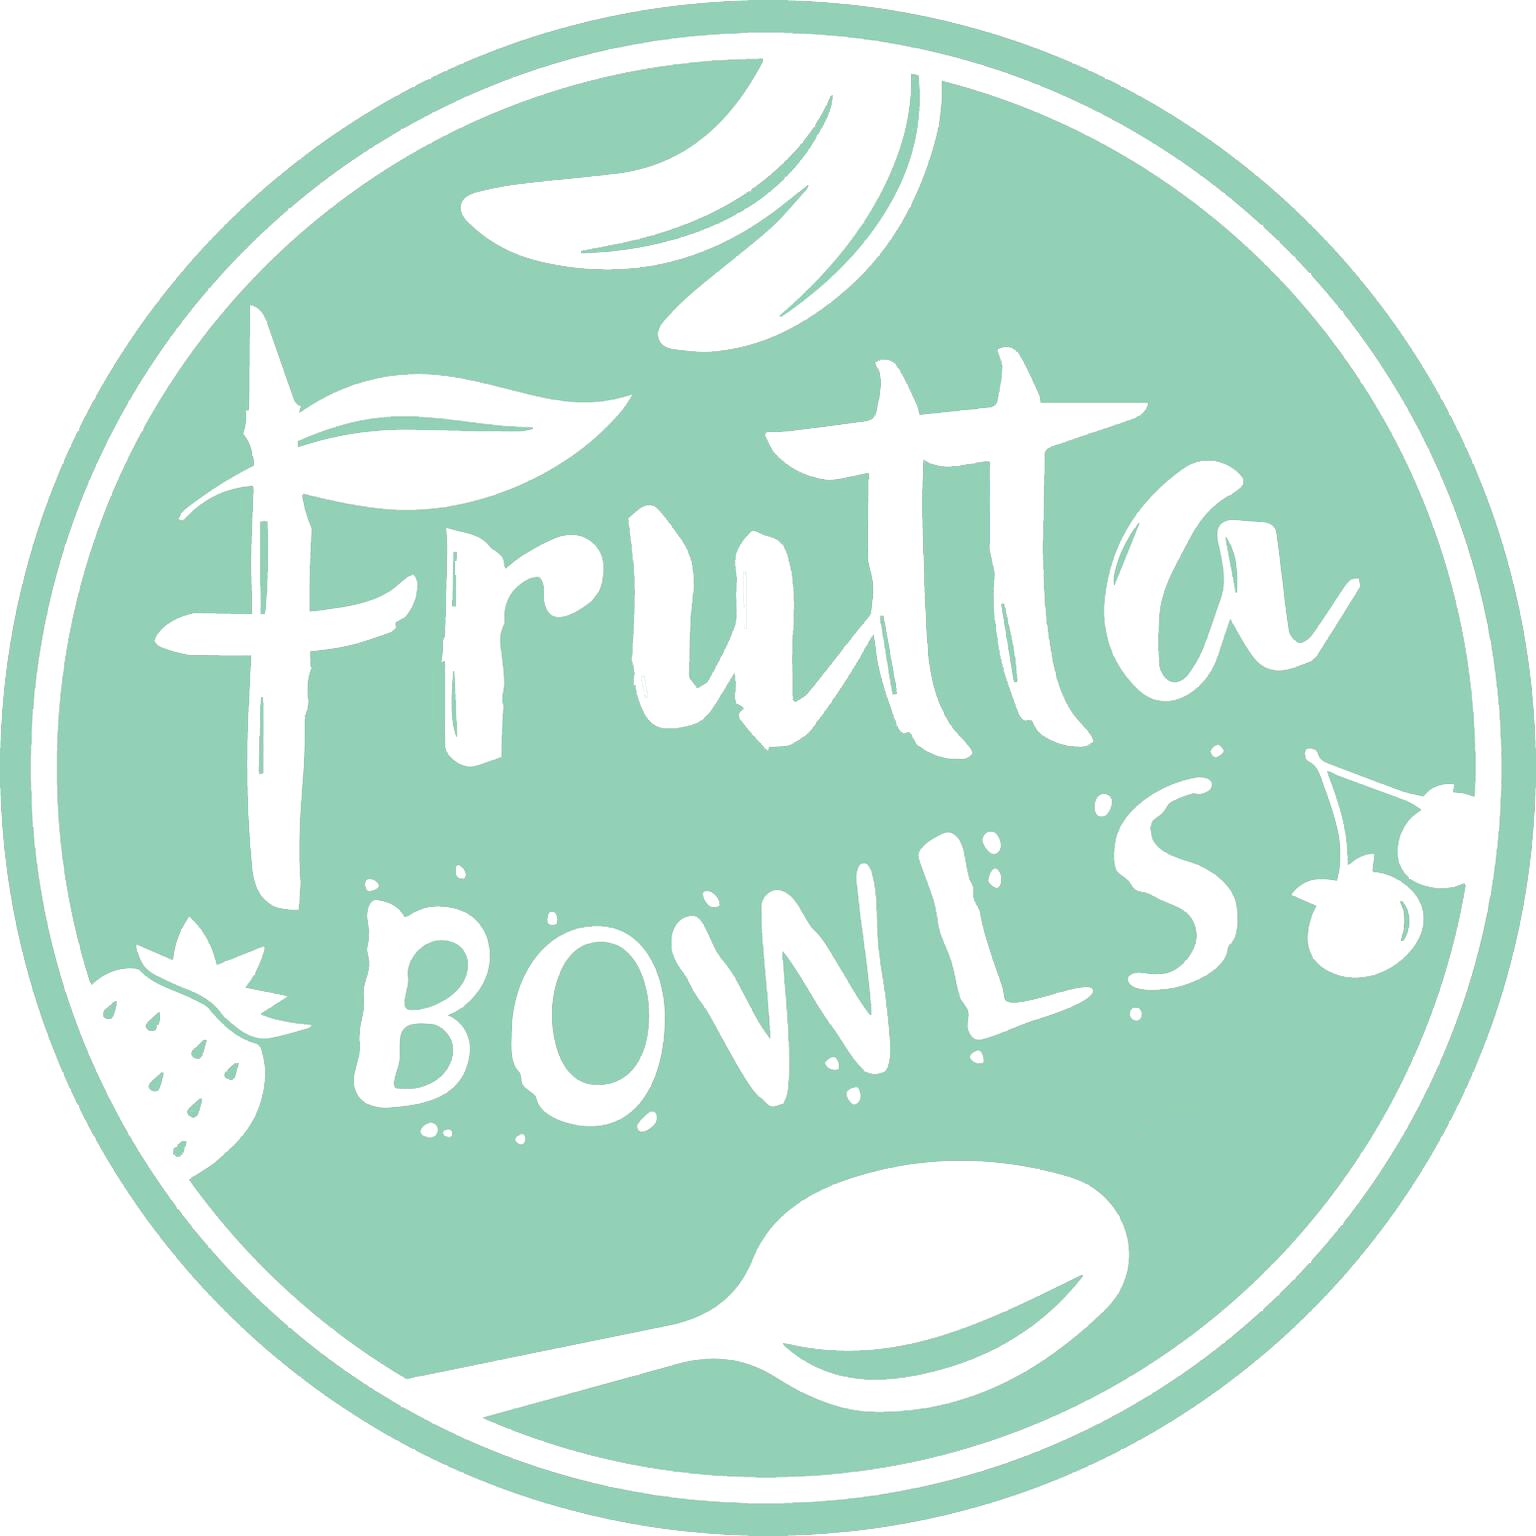 Ledge - Frutta Bowls Bookkeeping